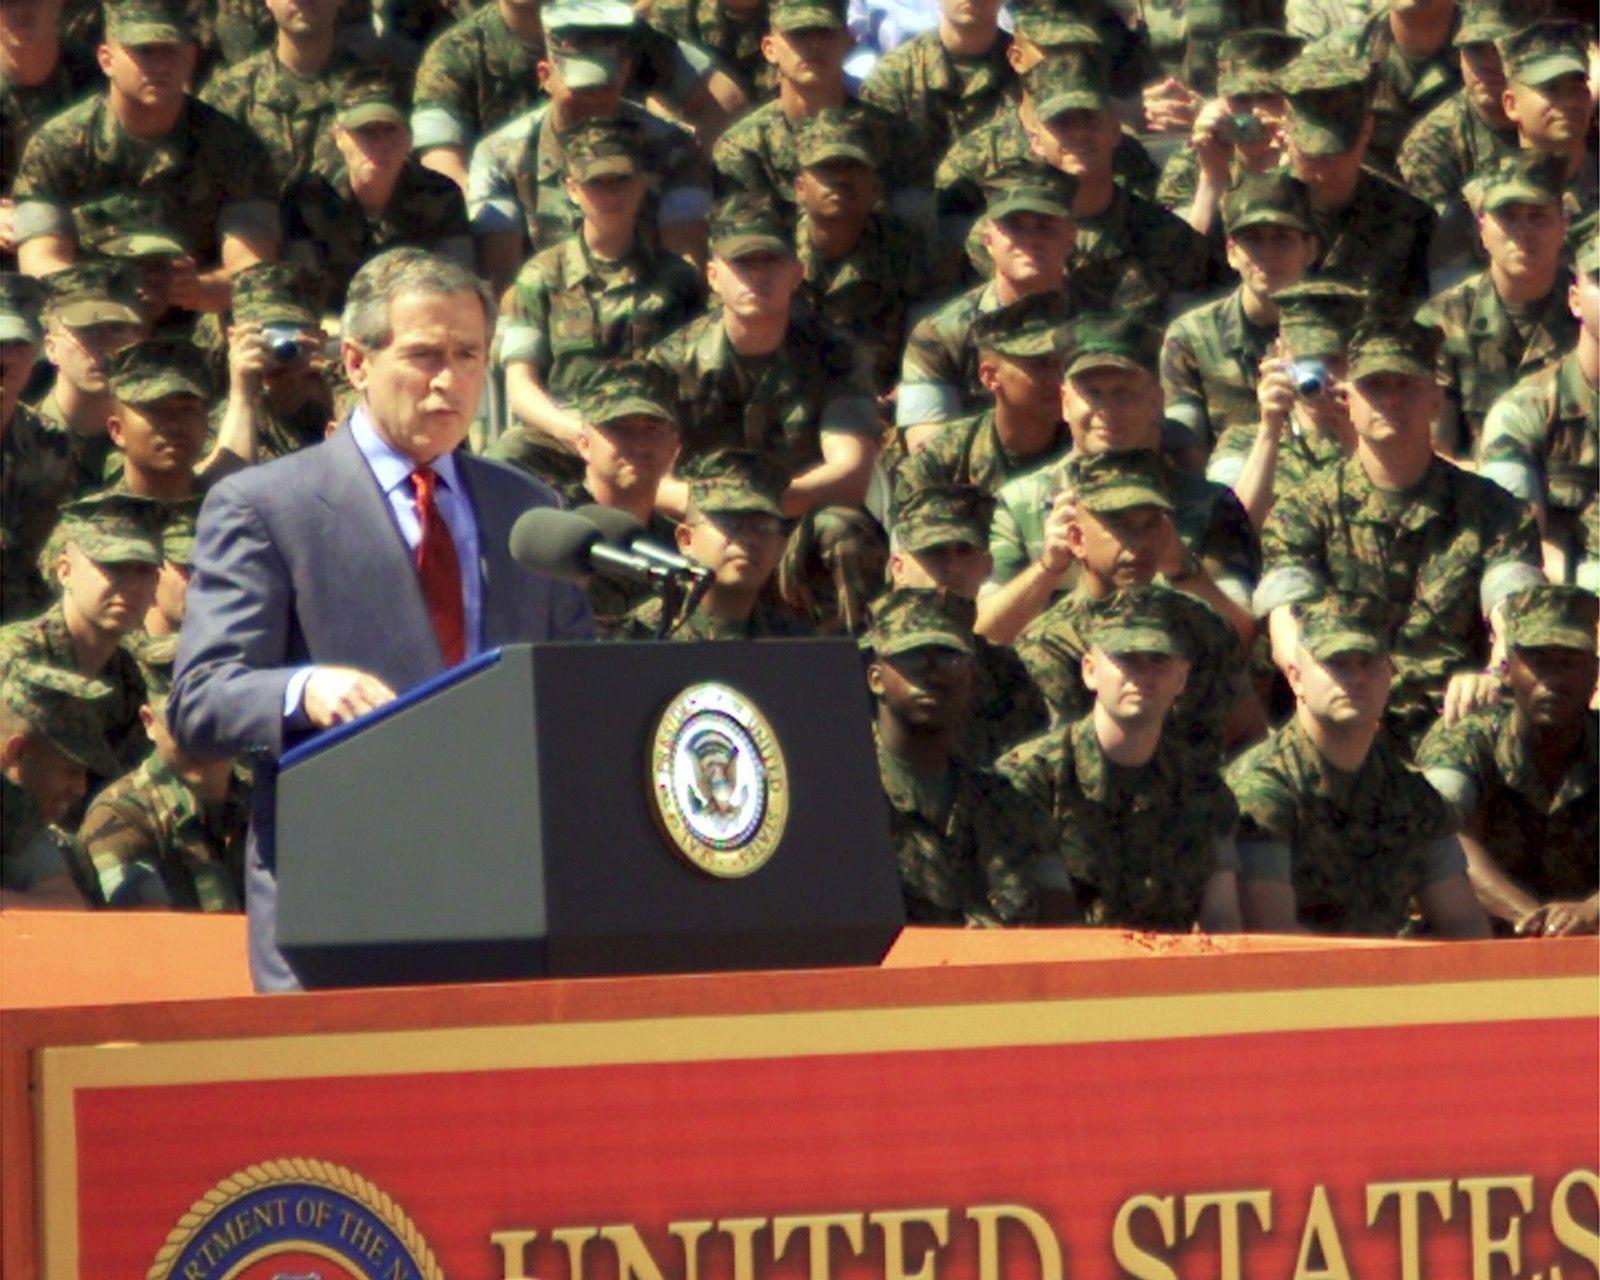 President George W. Bush speaks to Marines at Camp Lejeune 2003 Photo Print - $7.49 - $12.49